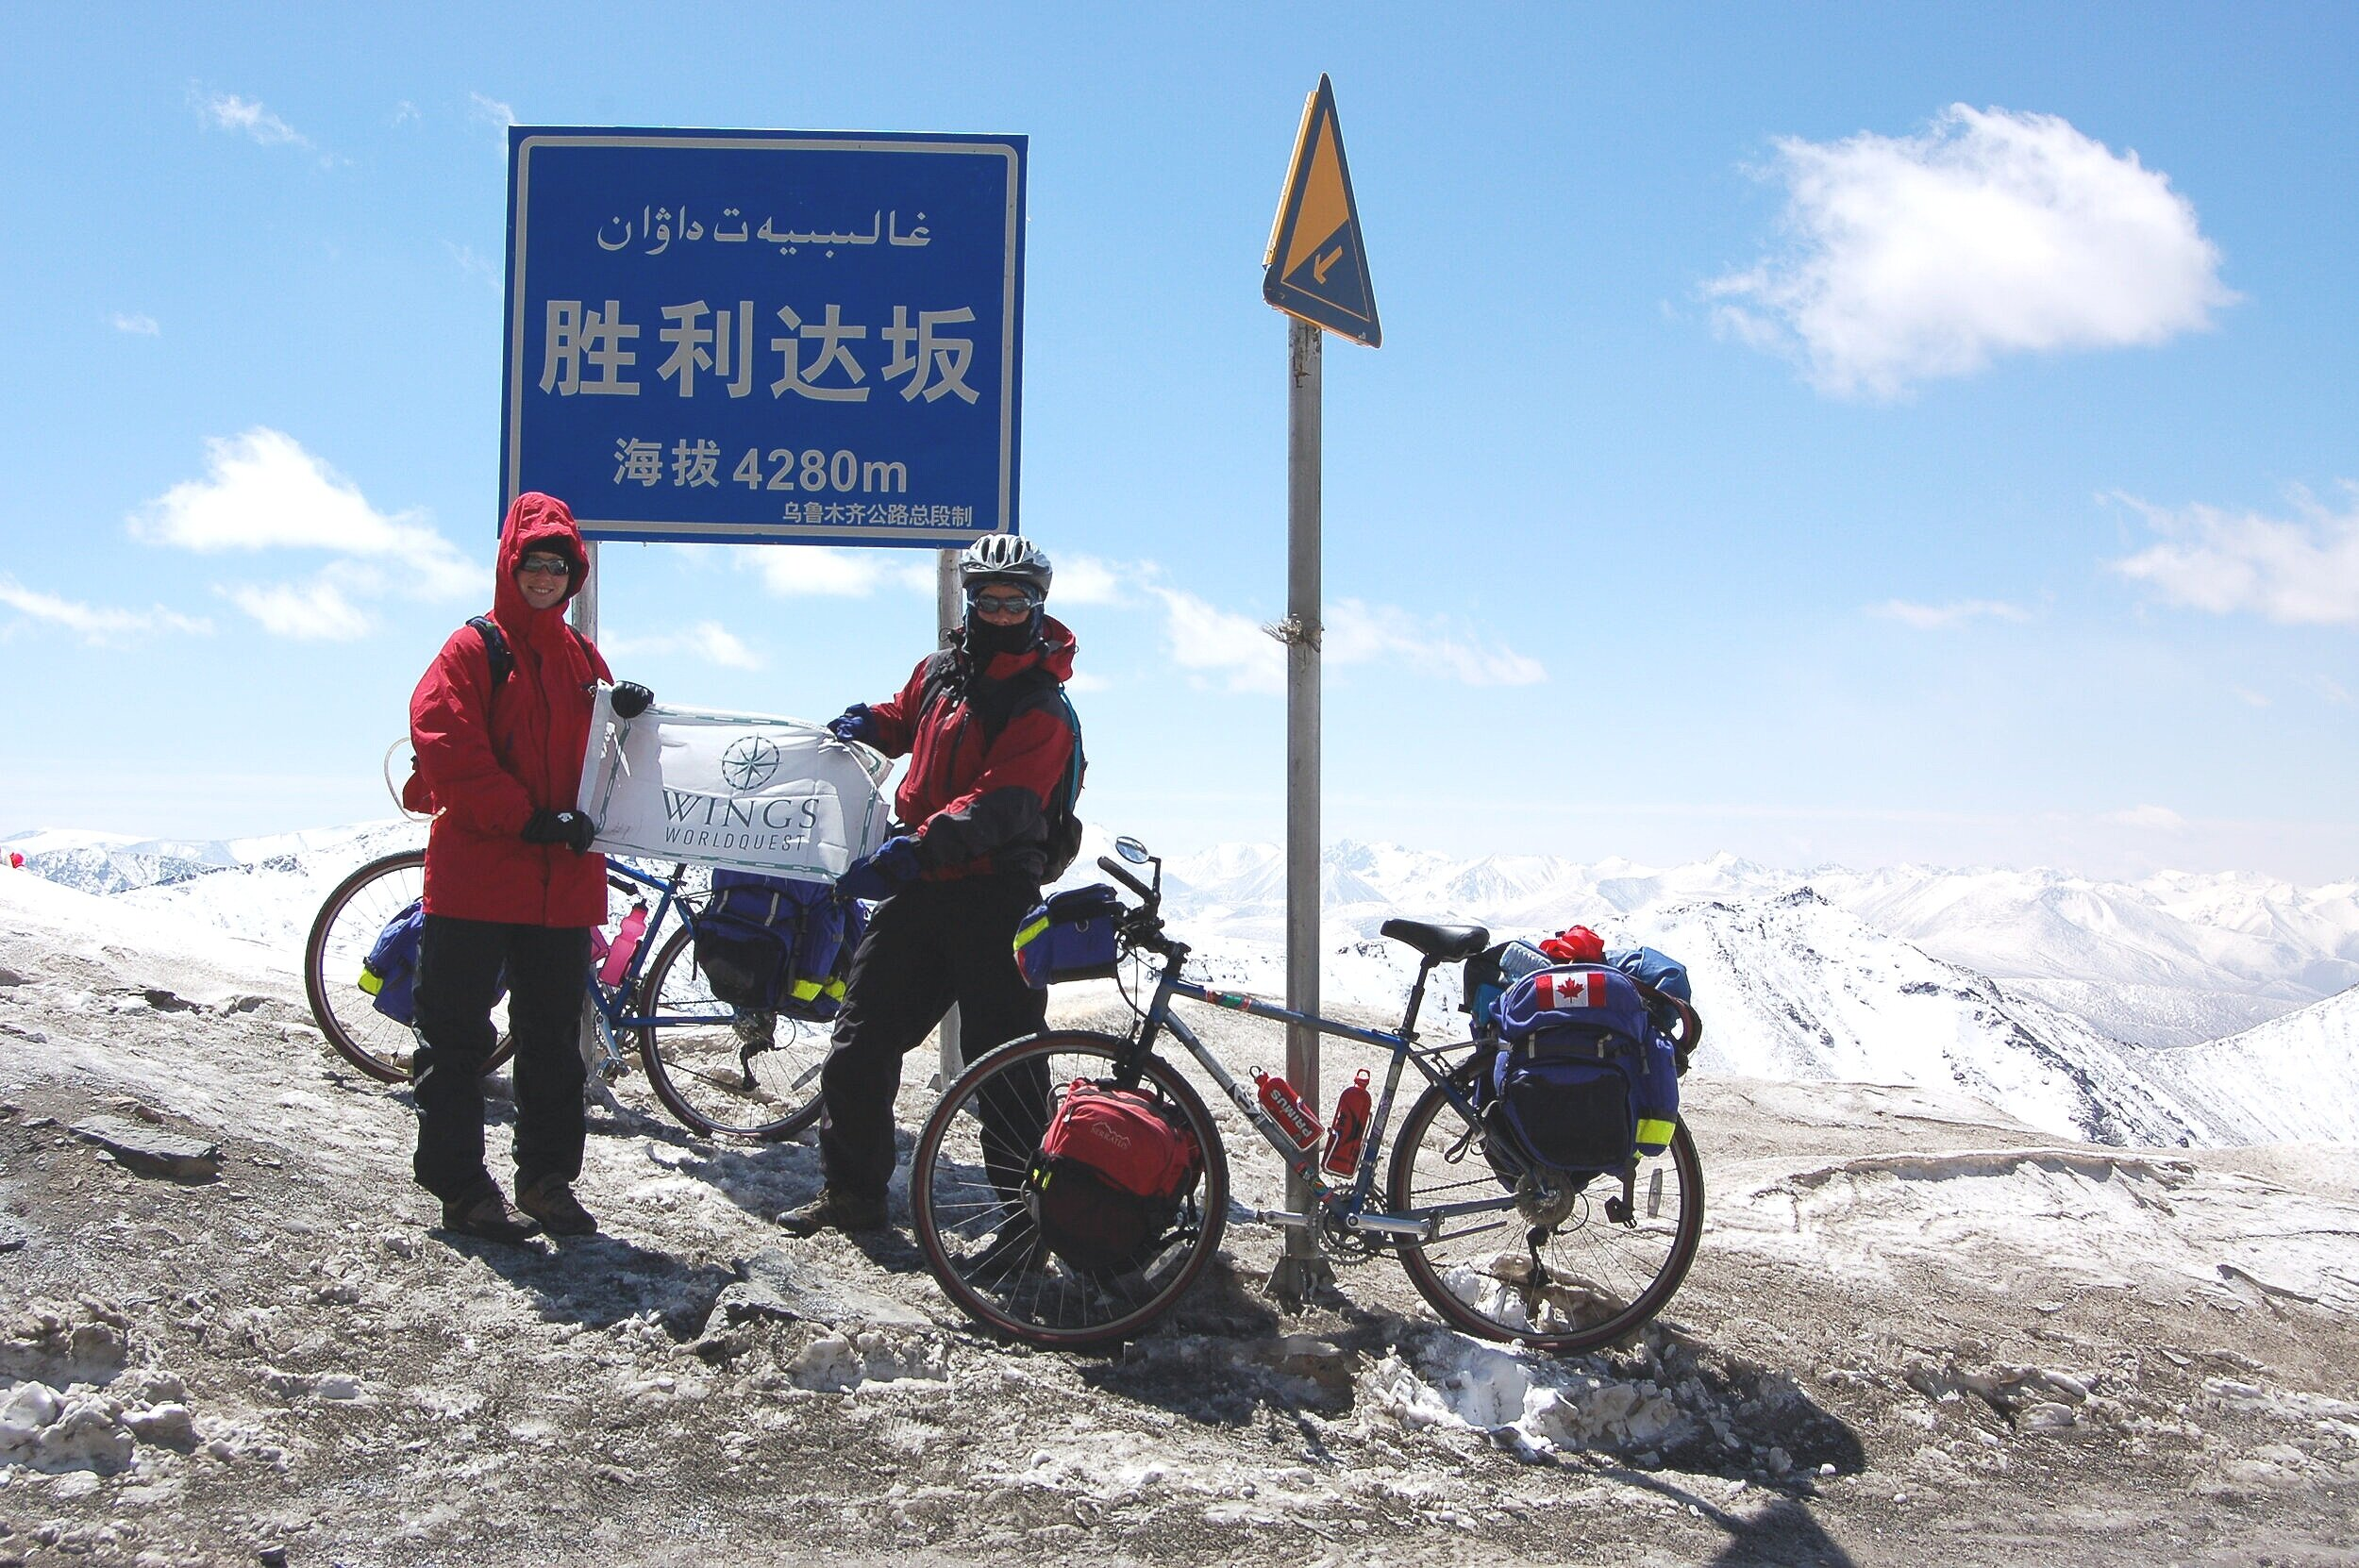 Kate+Harris+expedition+%28w_+flag%29.jpg